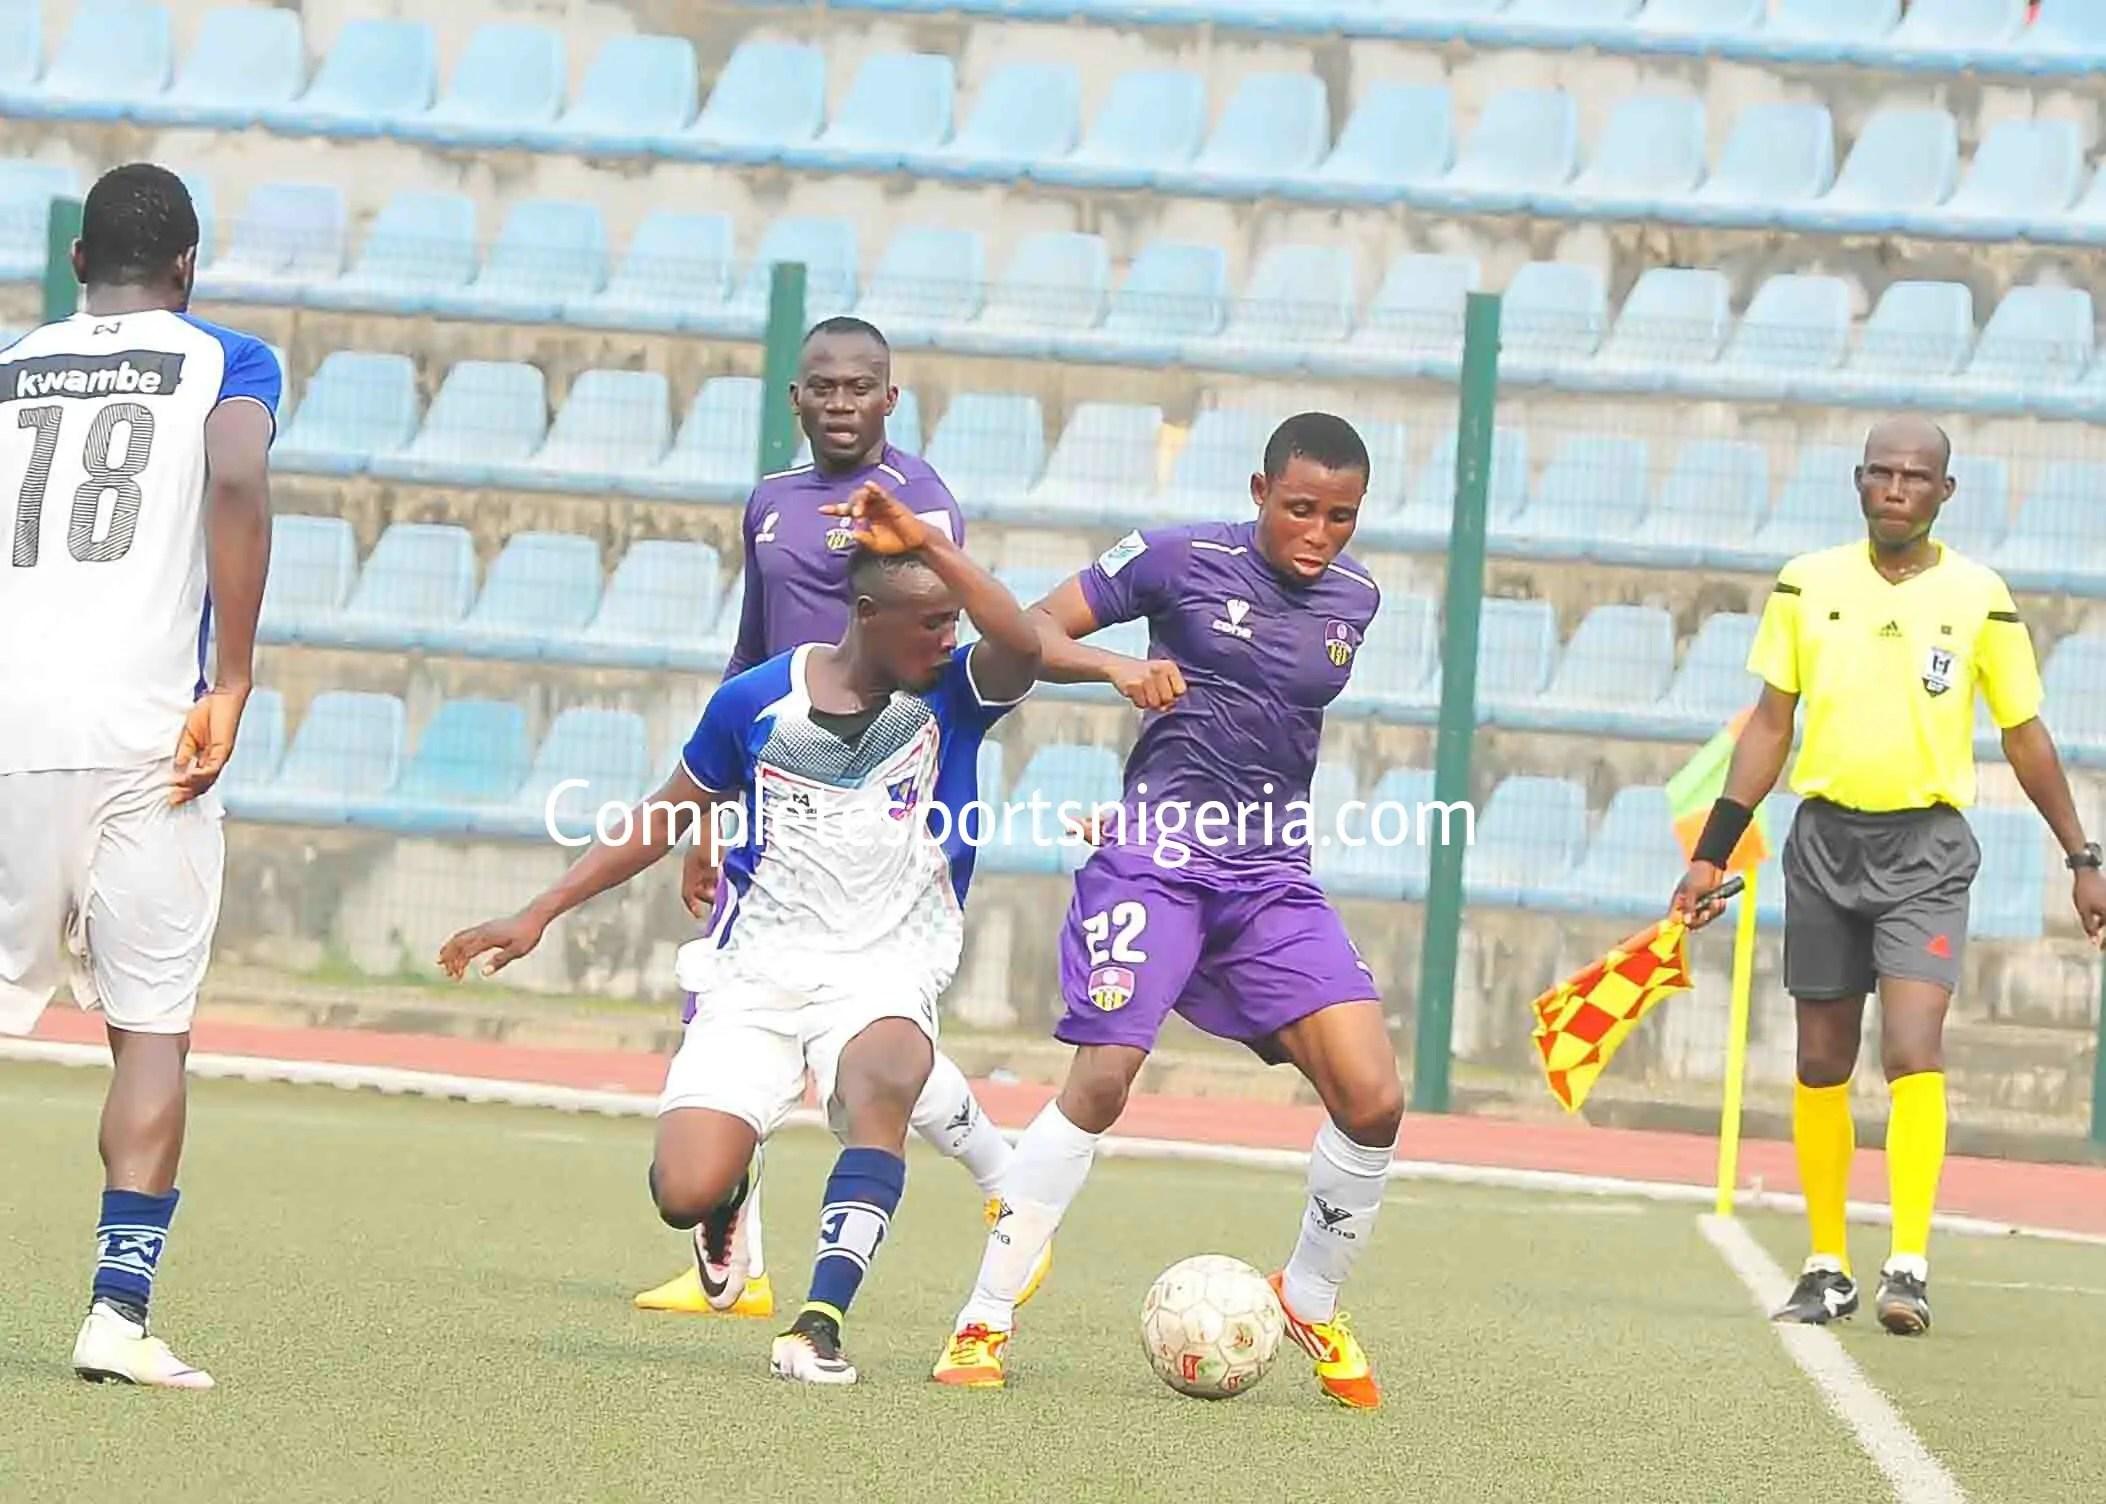 NPFL: ABS End MFM Run As Enyimba Edge Akwa United